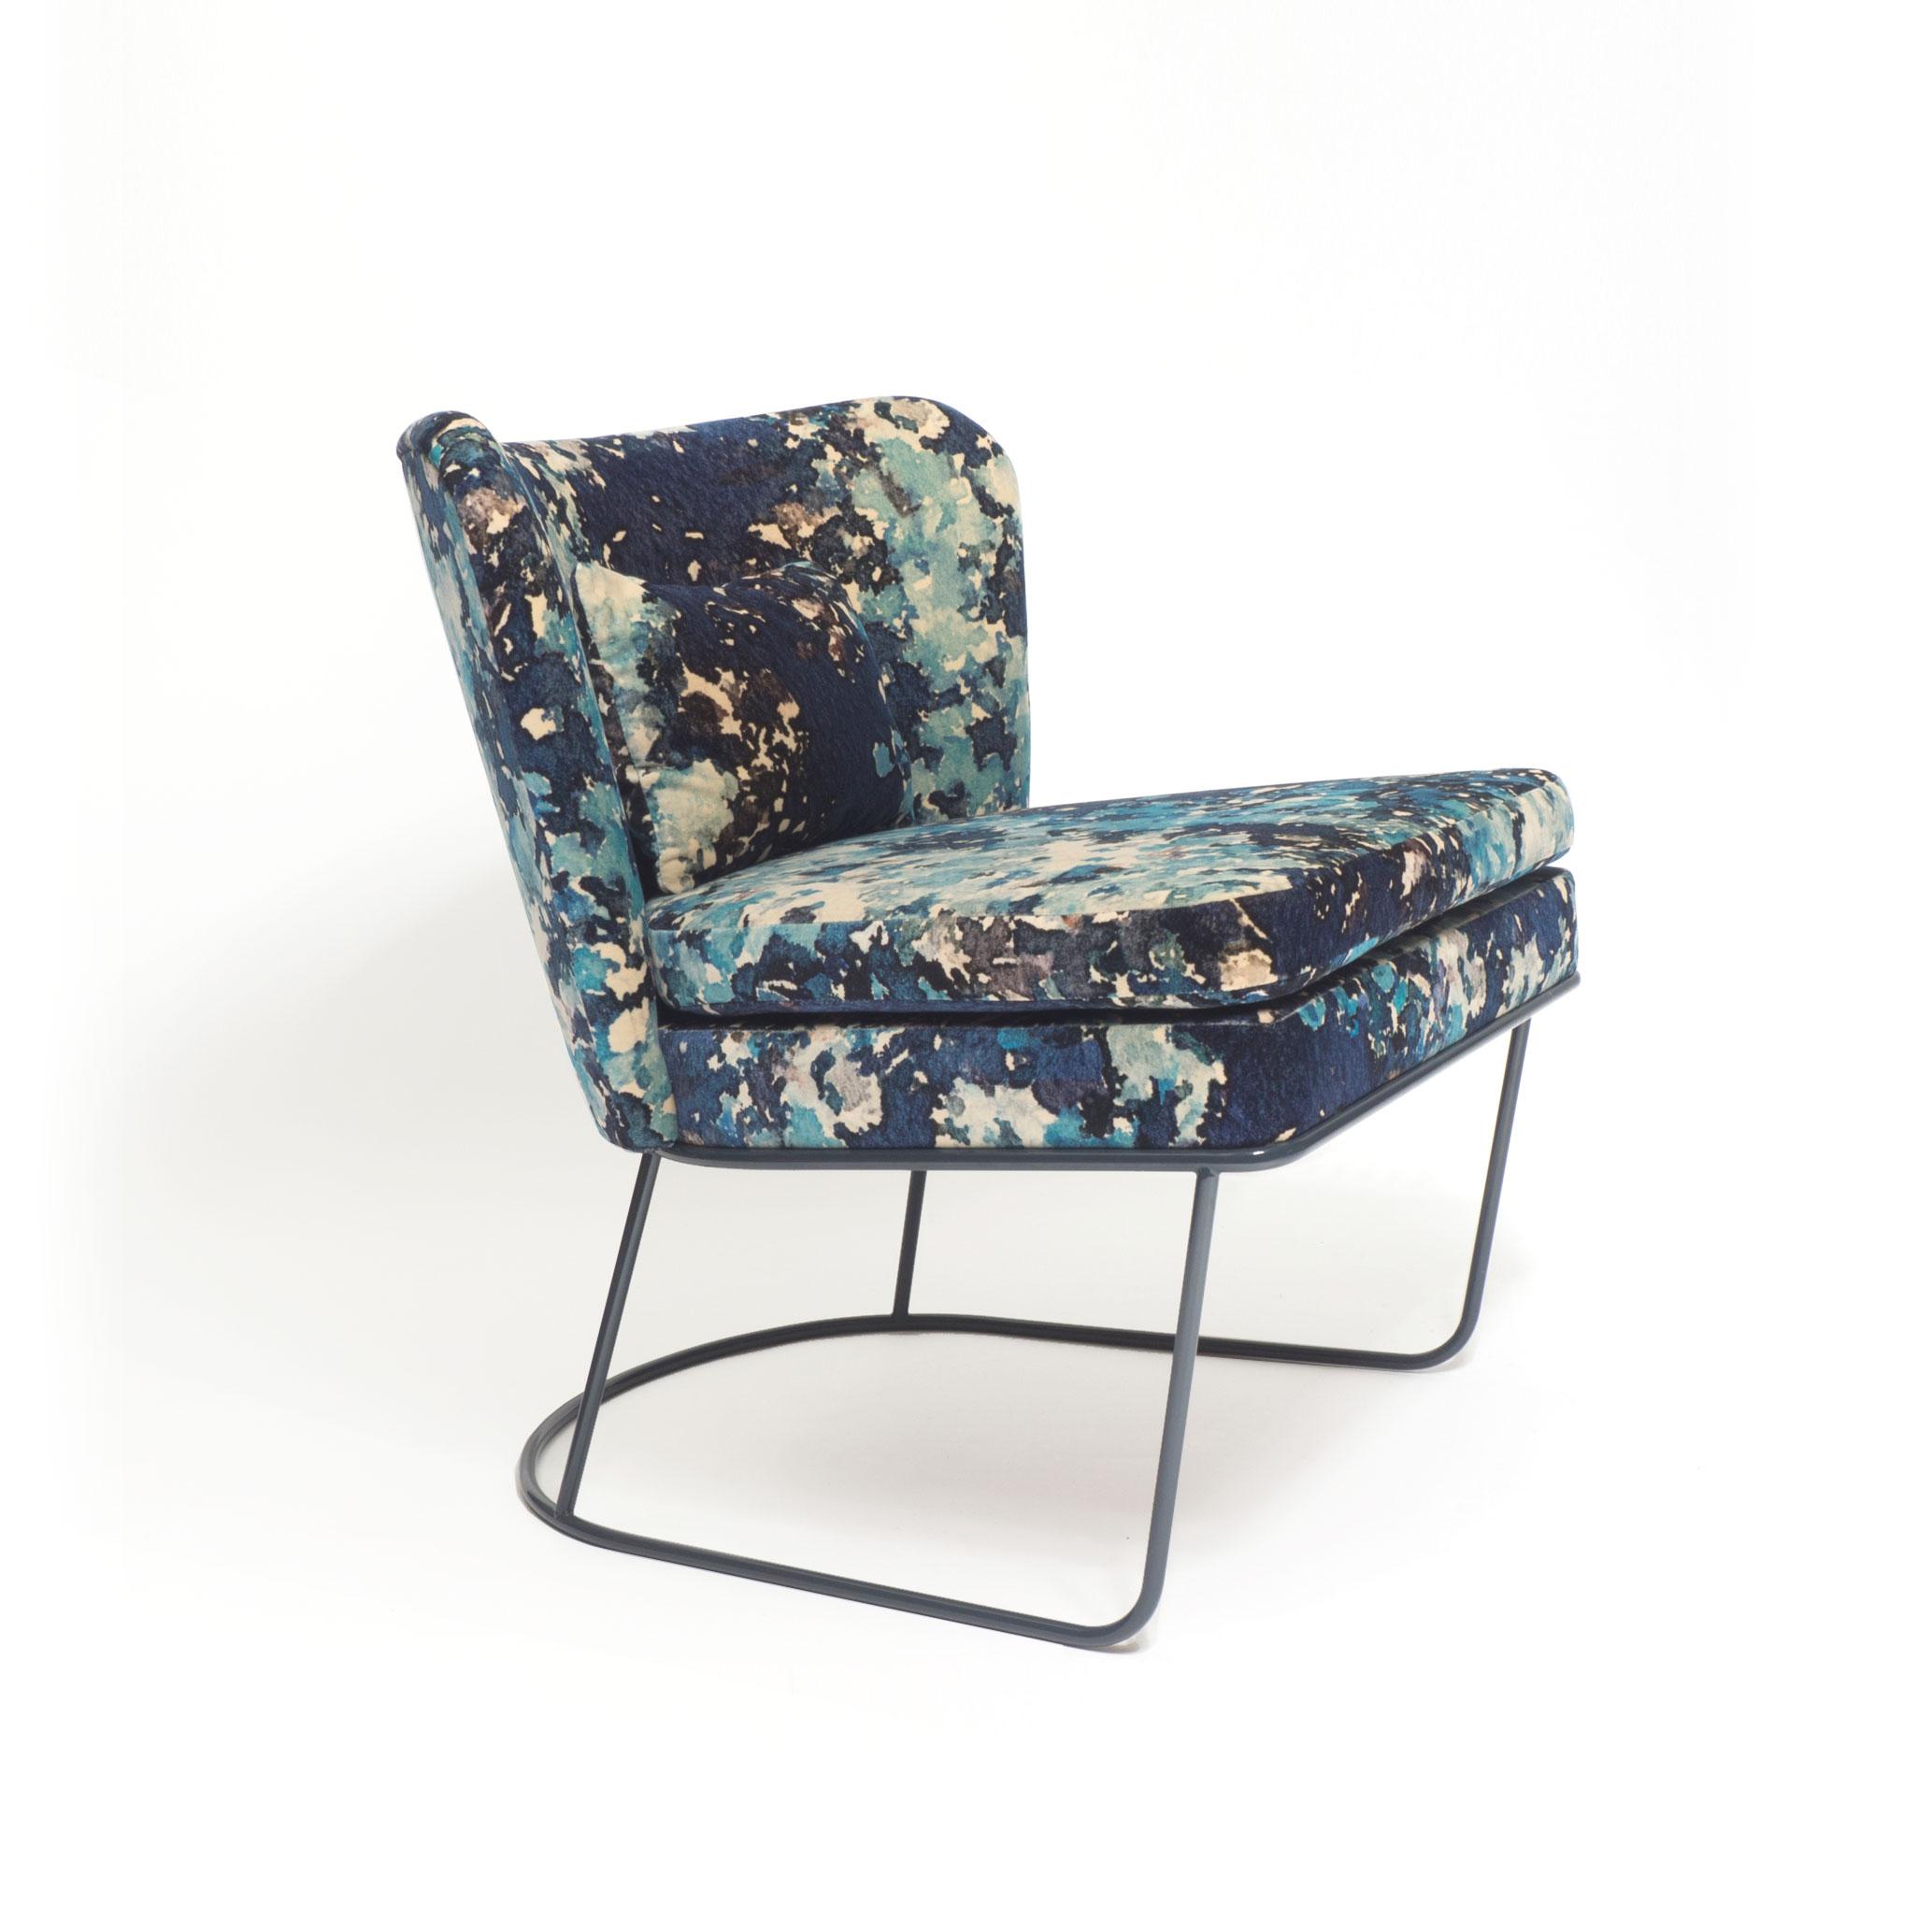 Imogen Heath & Dare Studio Chair